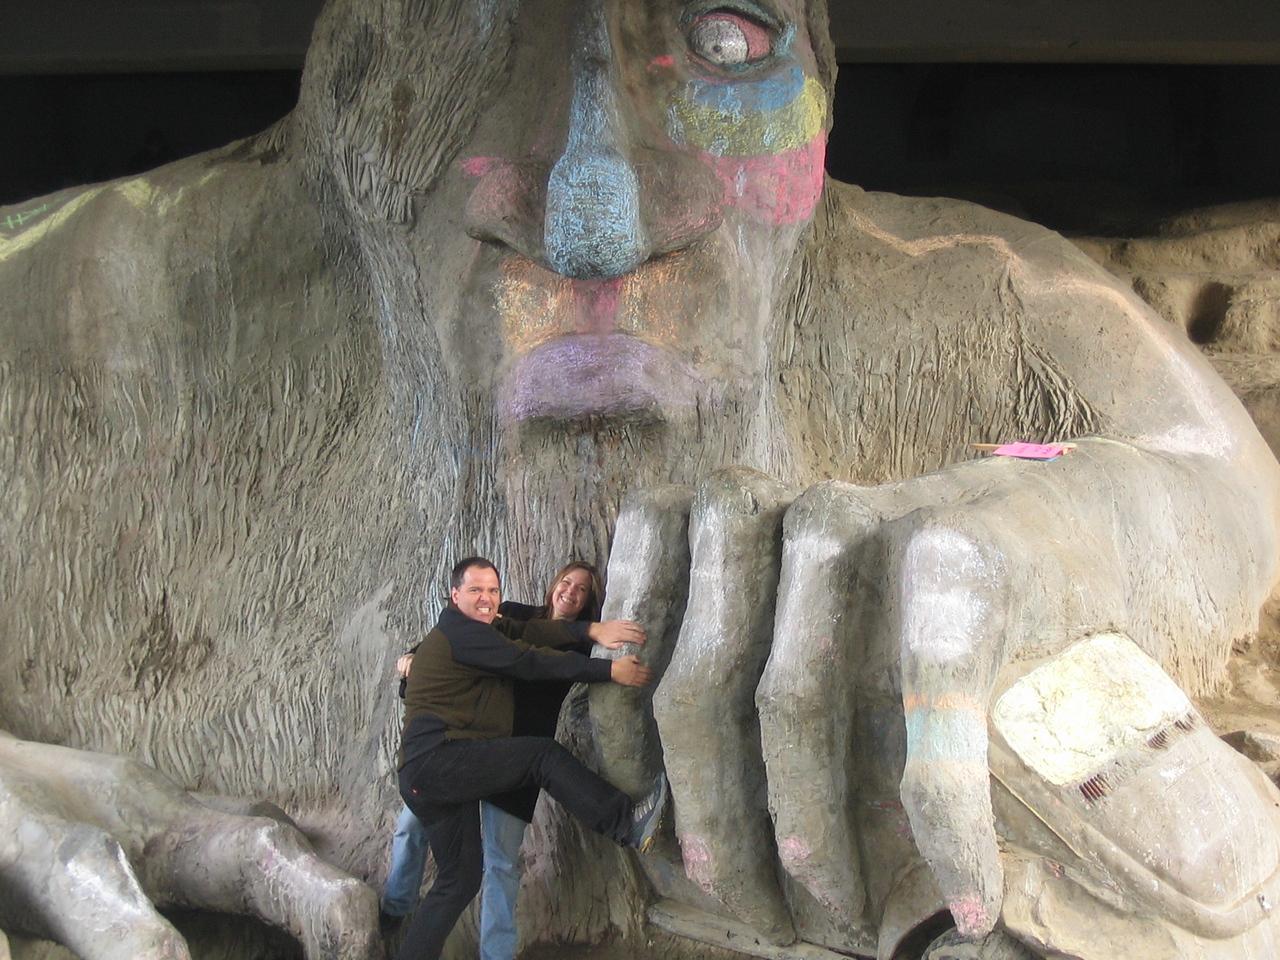 Doug & Karen at the troll